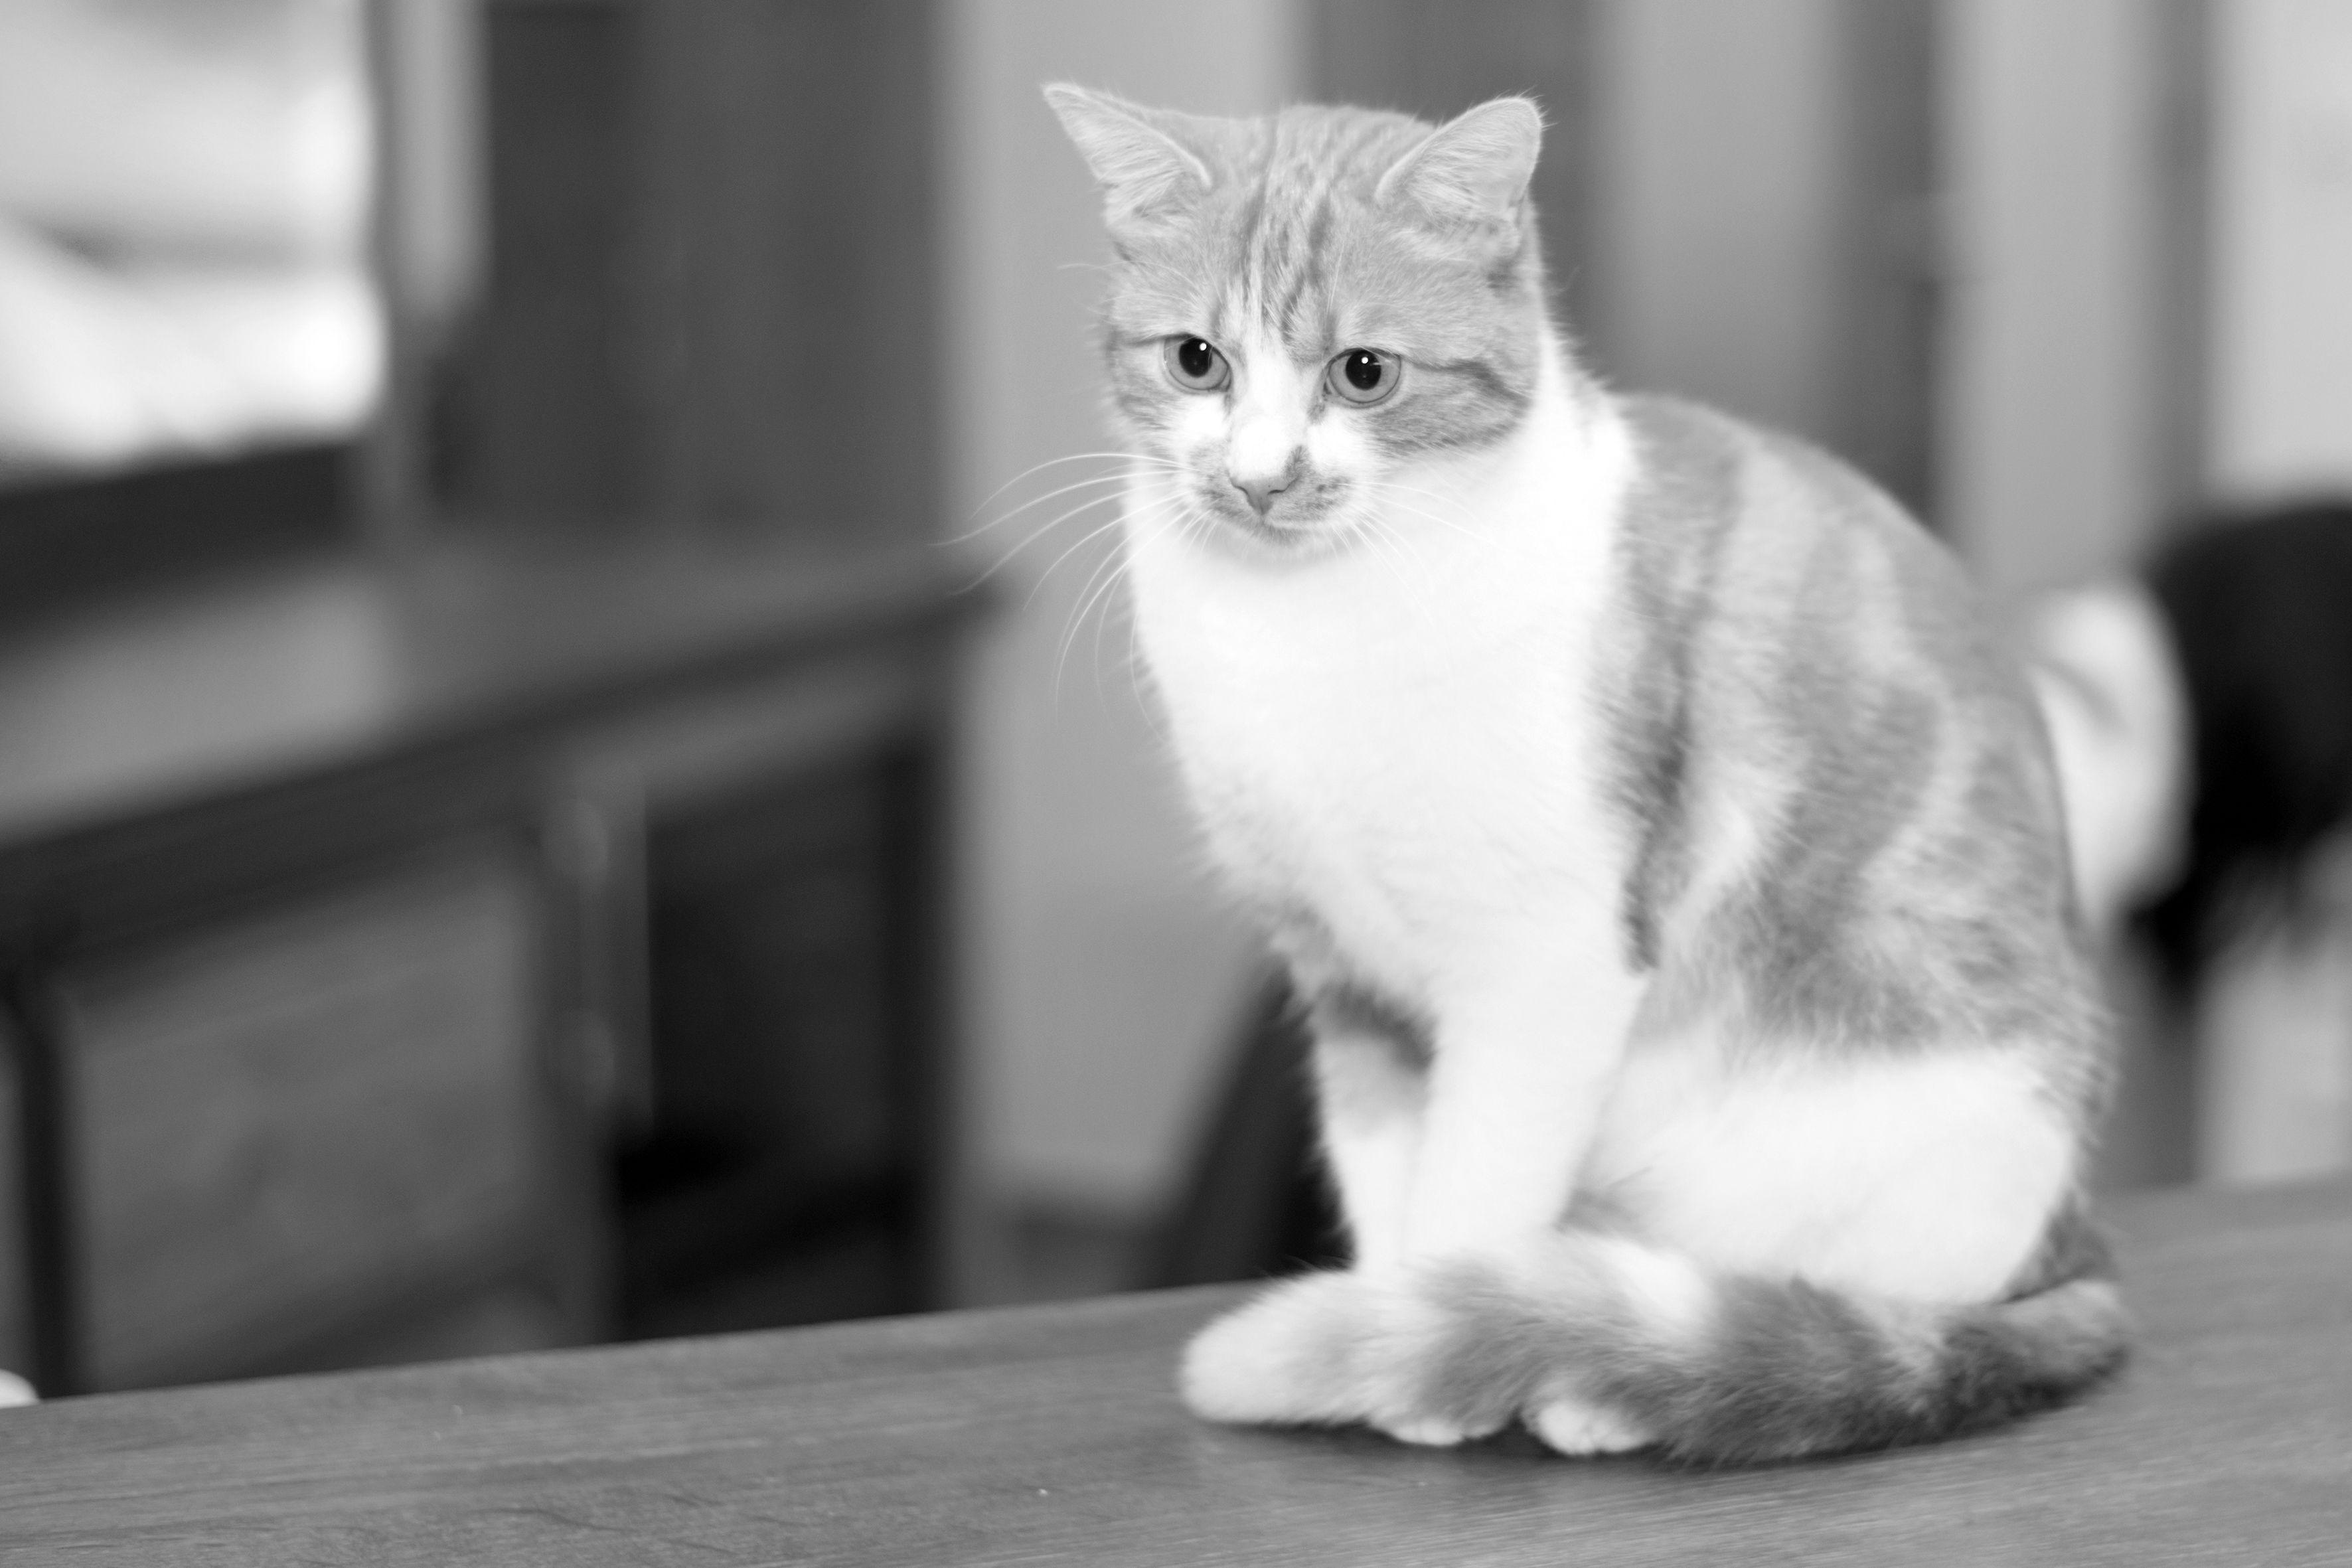 Unsere Hauskatze Kiki (mit Bildern) Hauskatze, Katzen